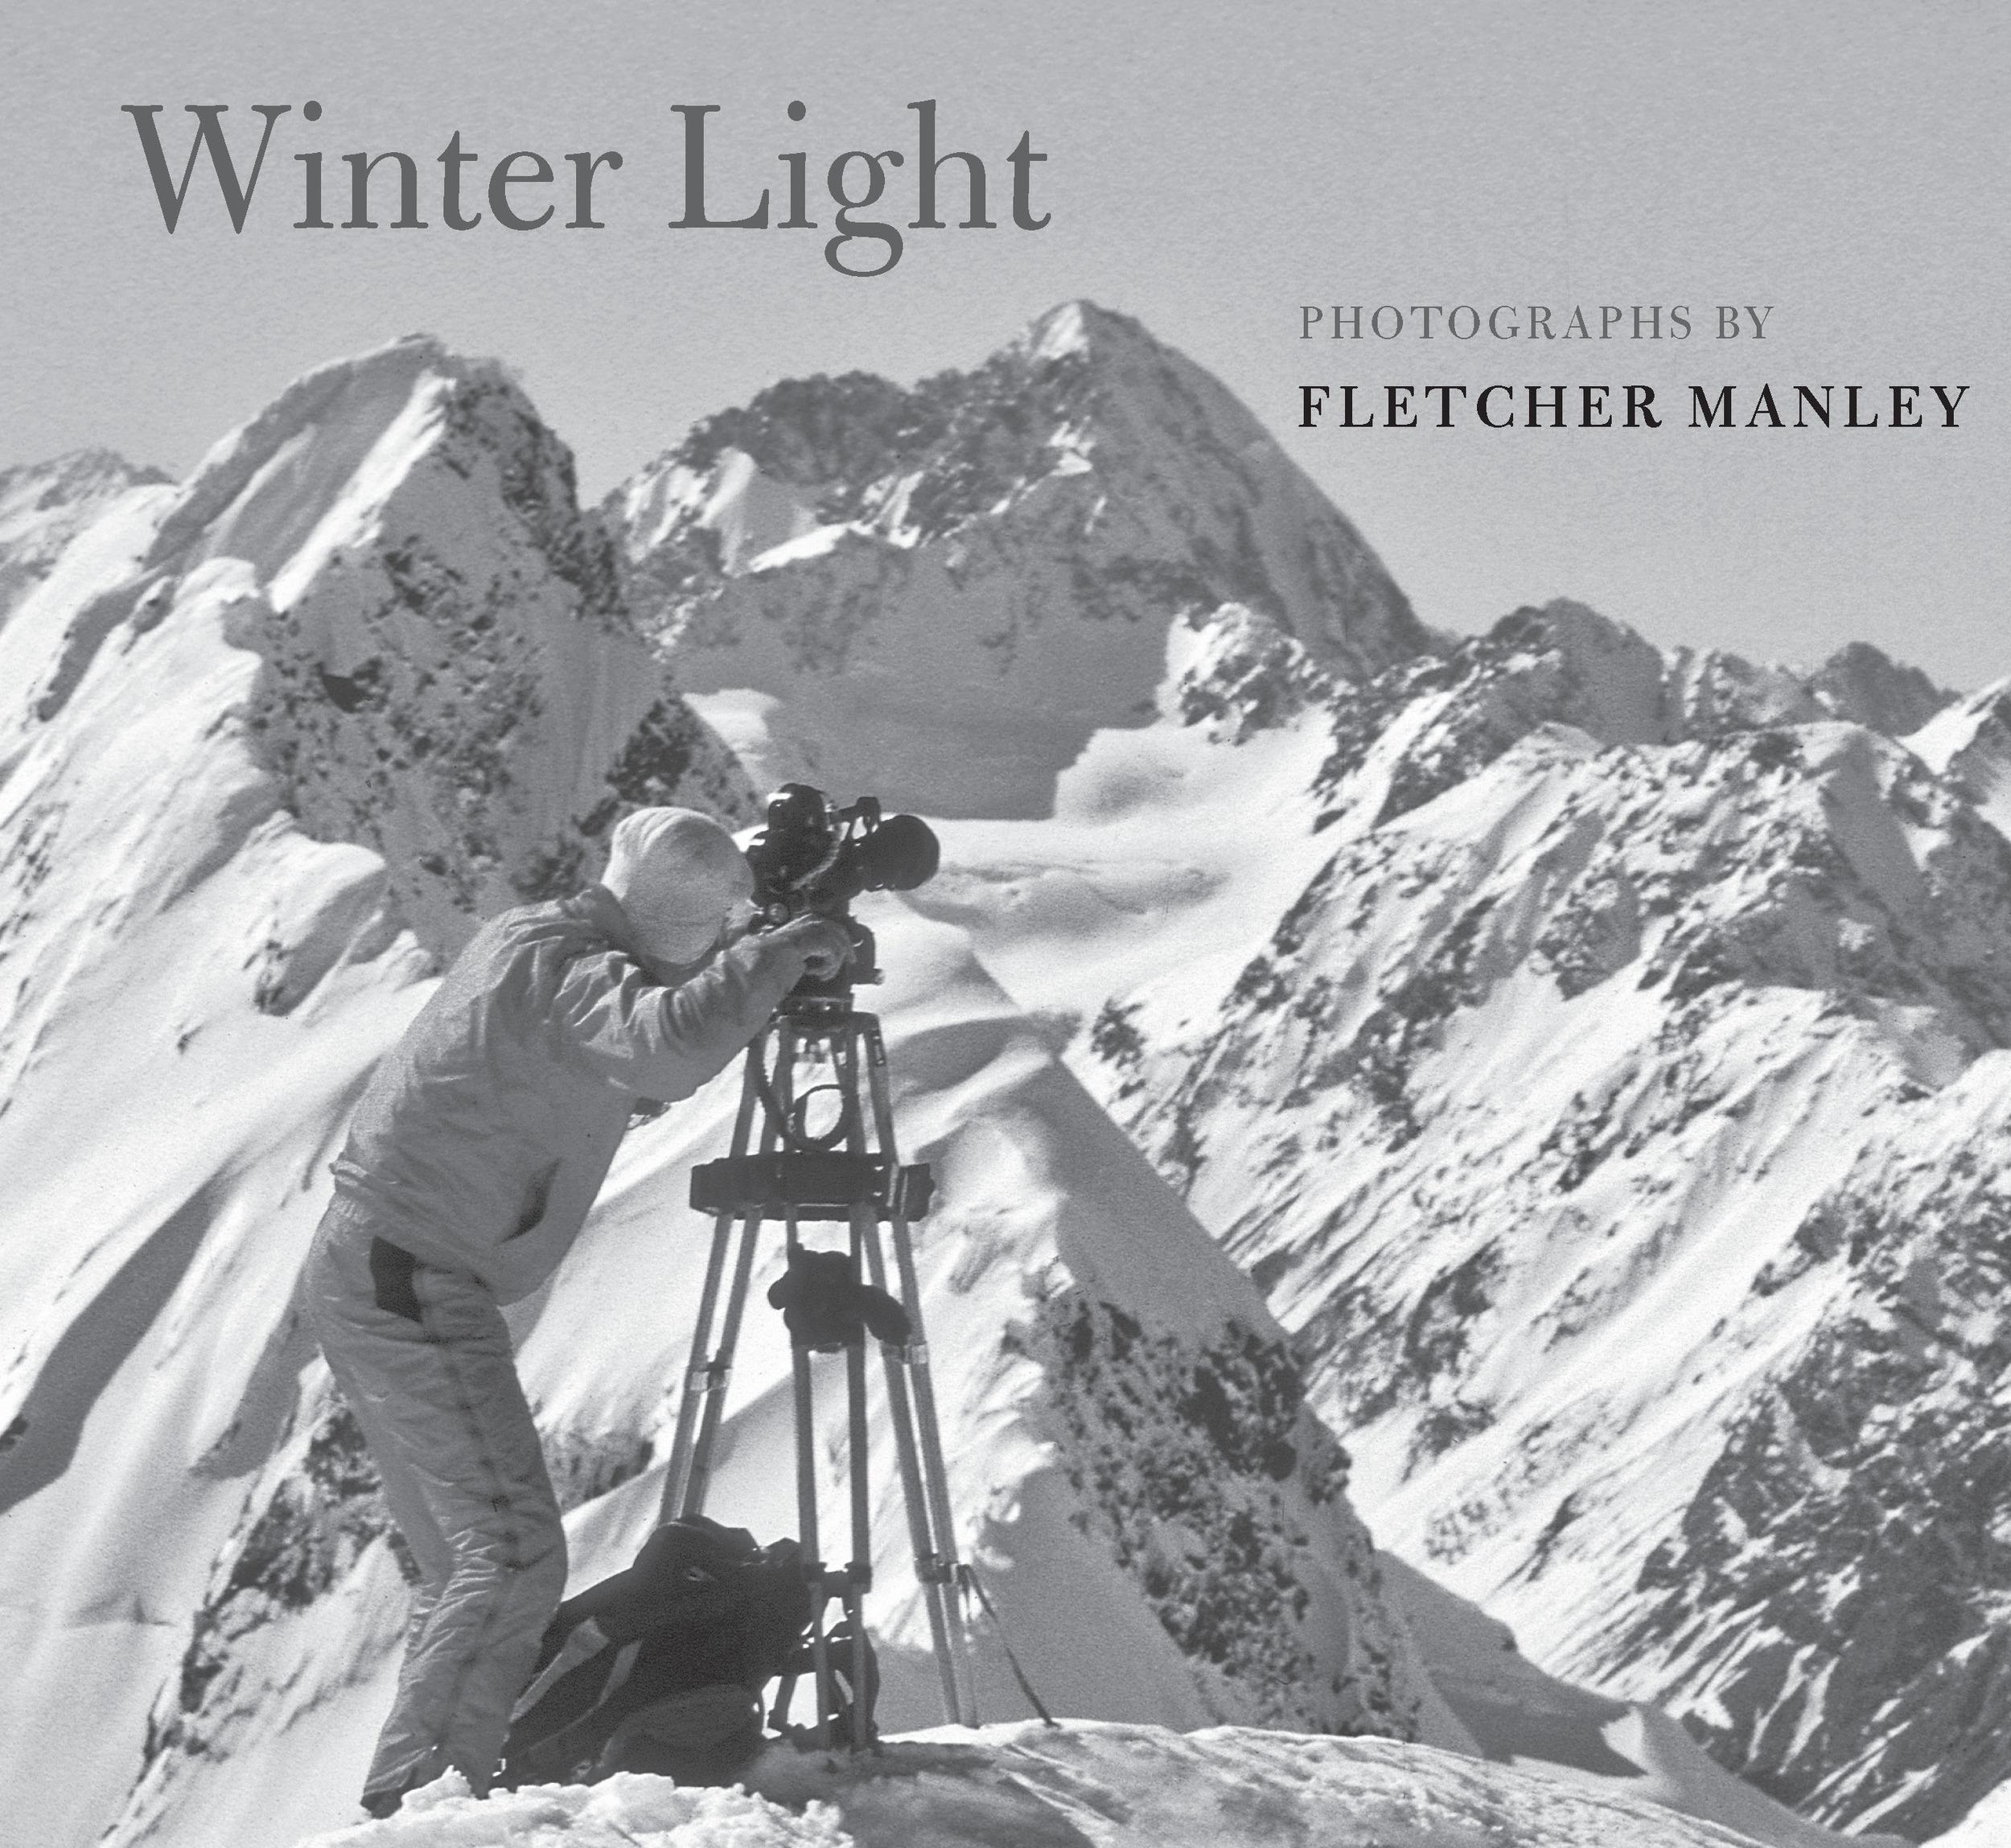 Fletcher Manley